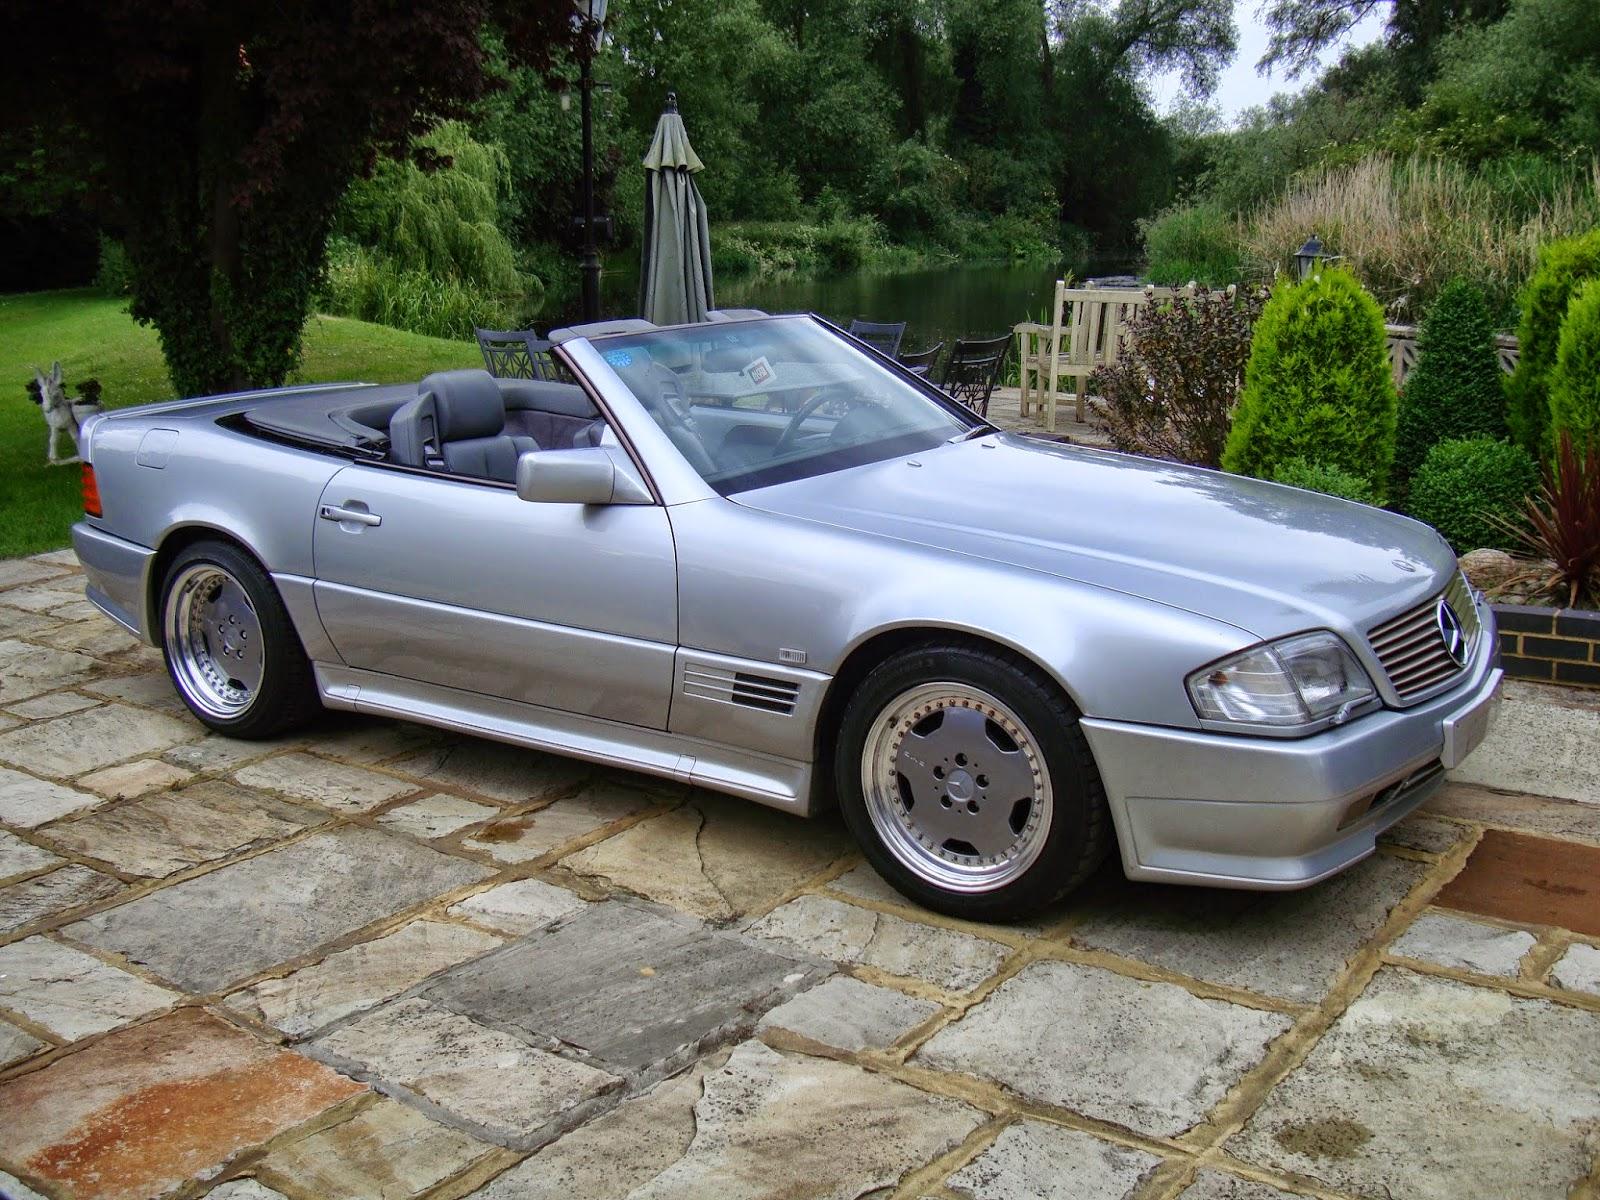 Mercedes-Benz R129 SL500 6 0 AMG | BENZTUNING